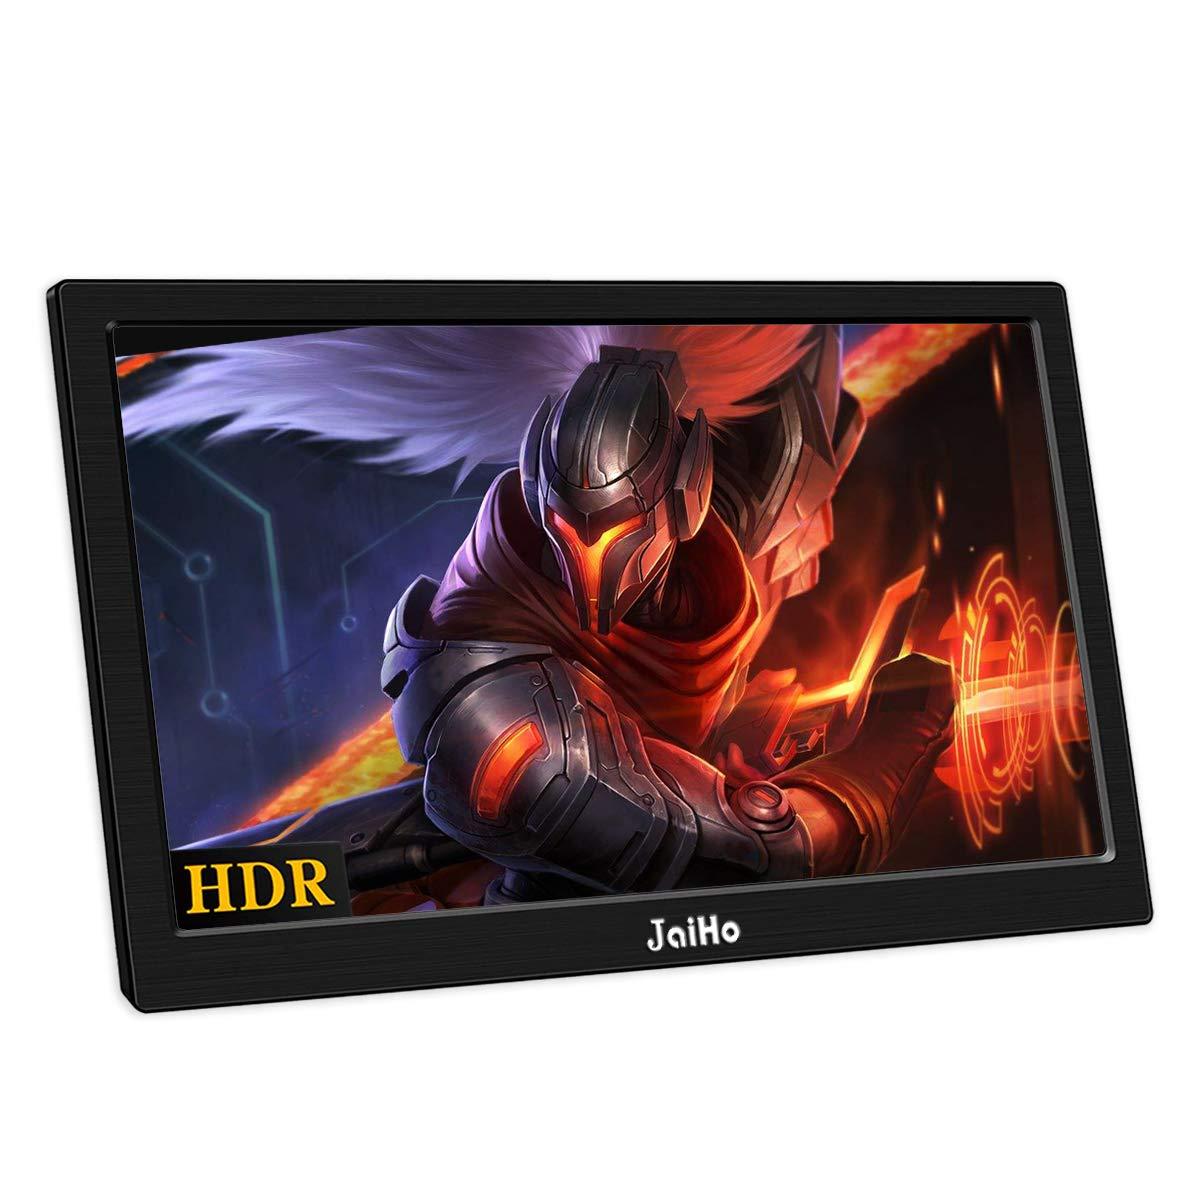 Monitor Portatil USB 15.6 1920x1080 HDR HDMI JAIHO